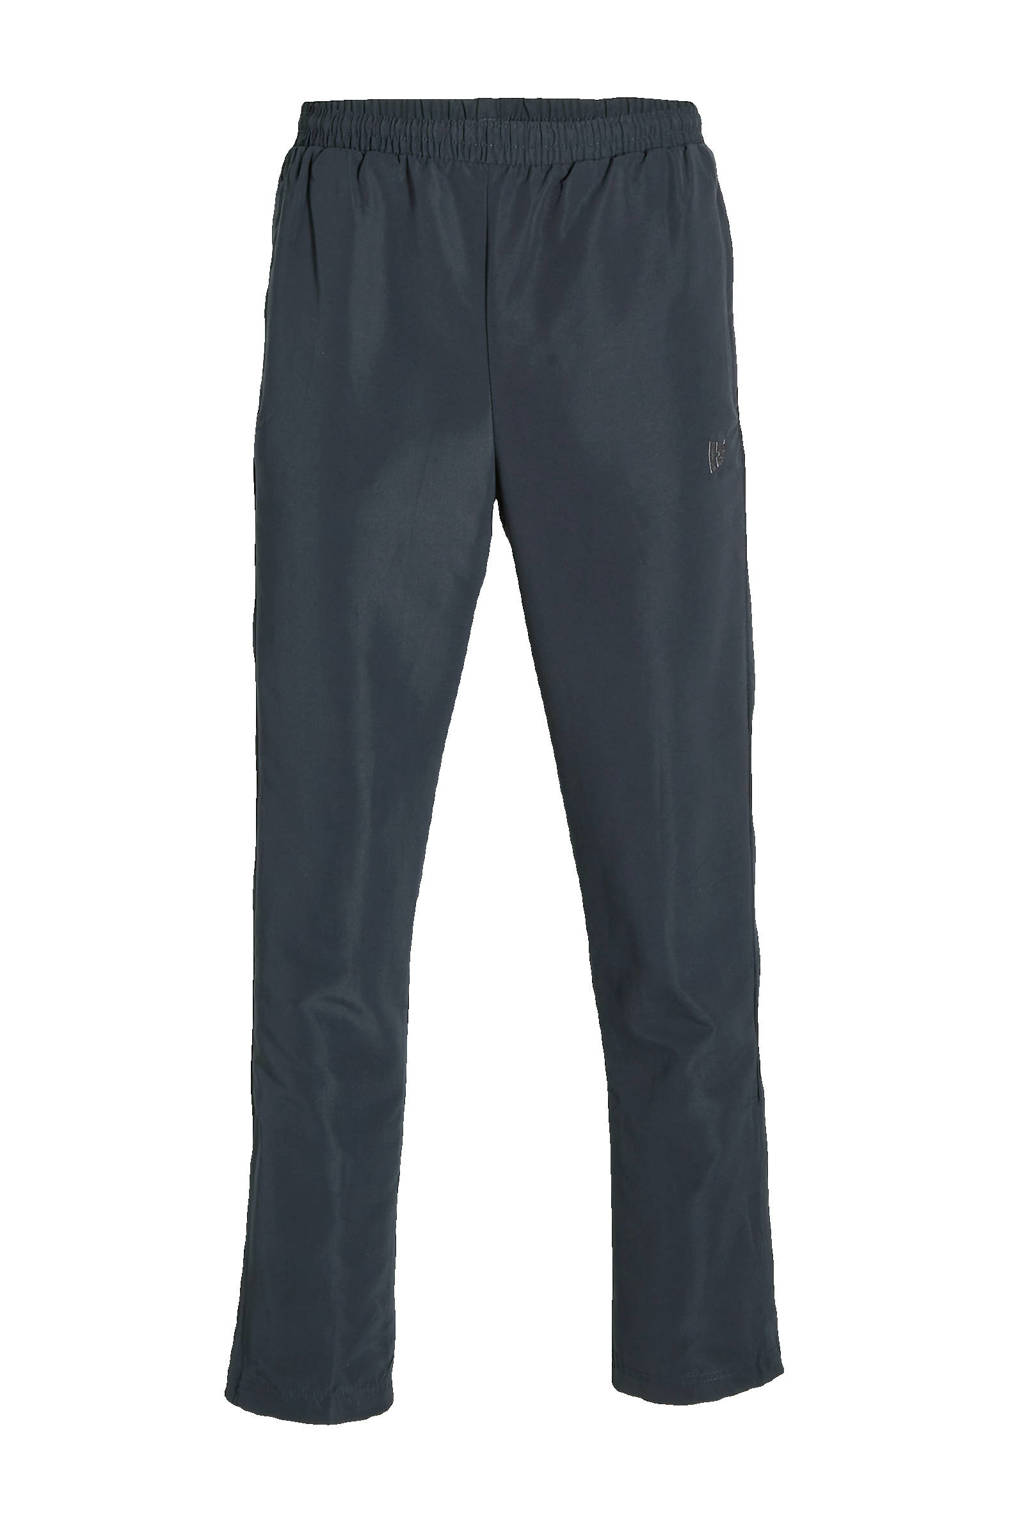 Donnay   trainingsbroek donkerblauw, Donkerblauw